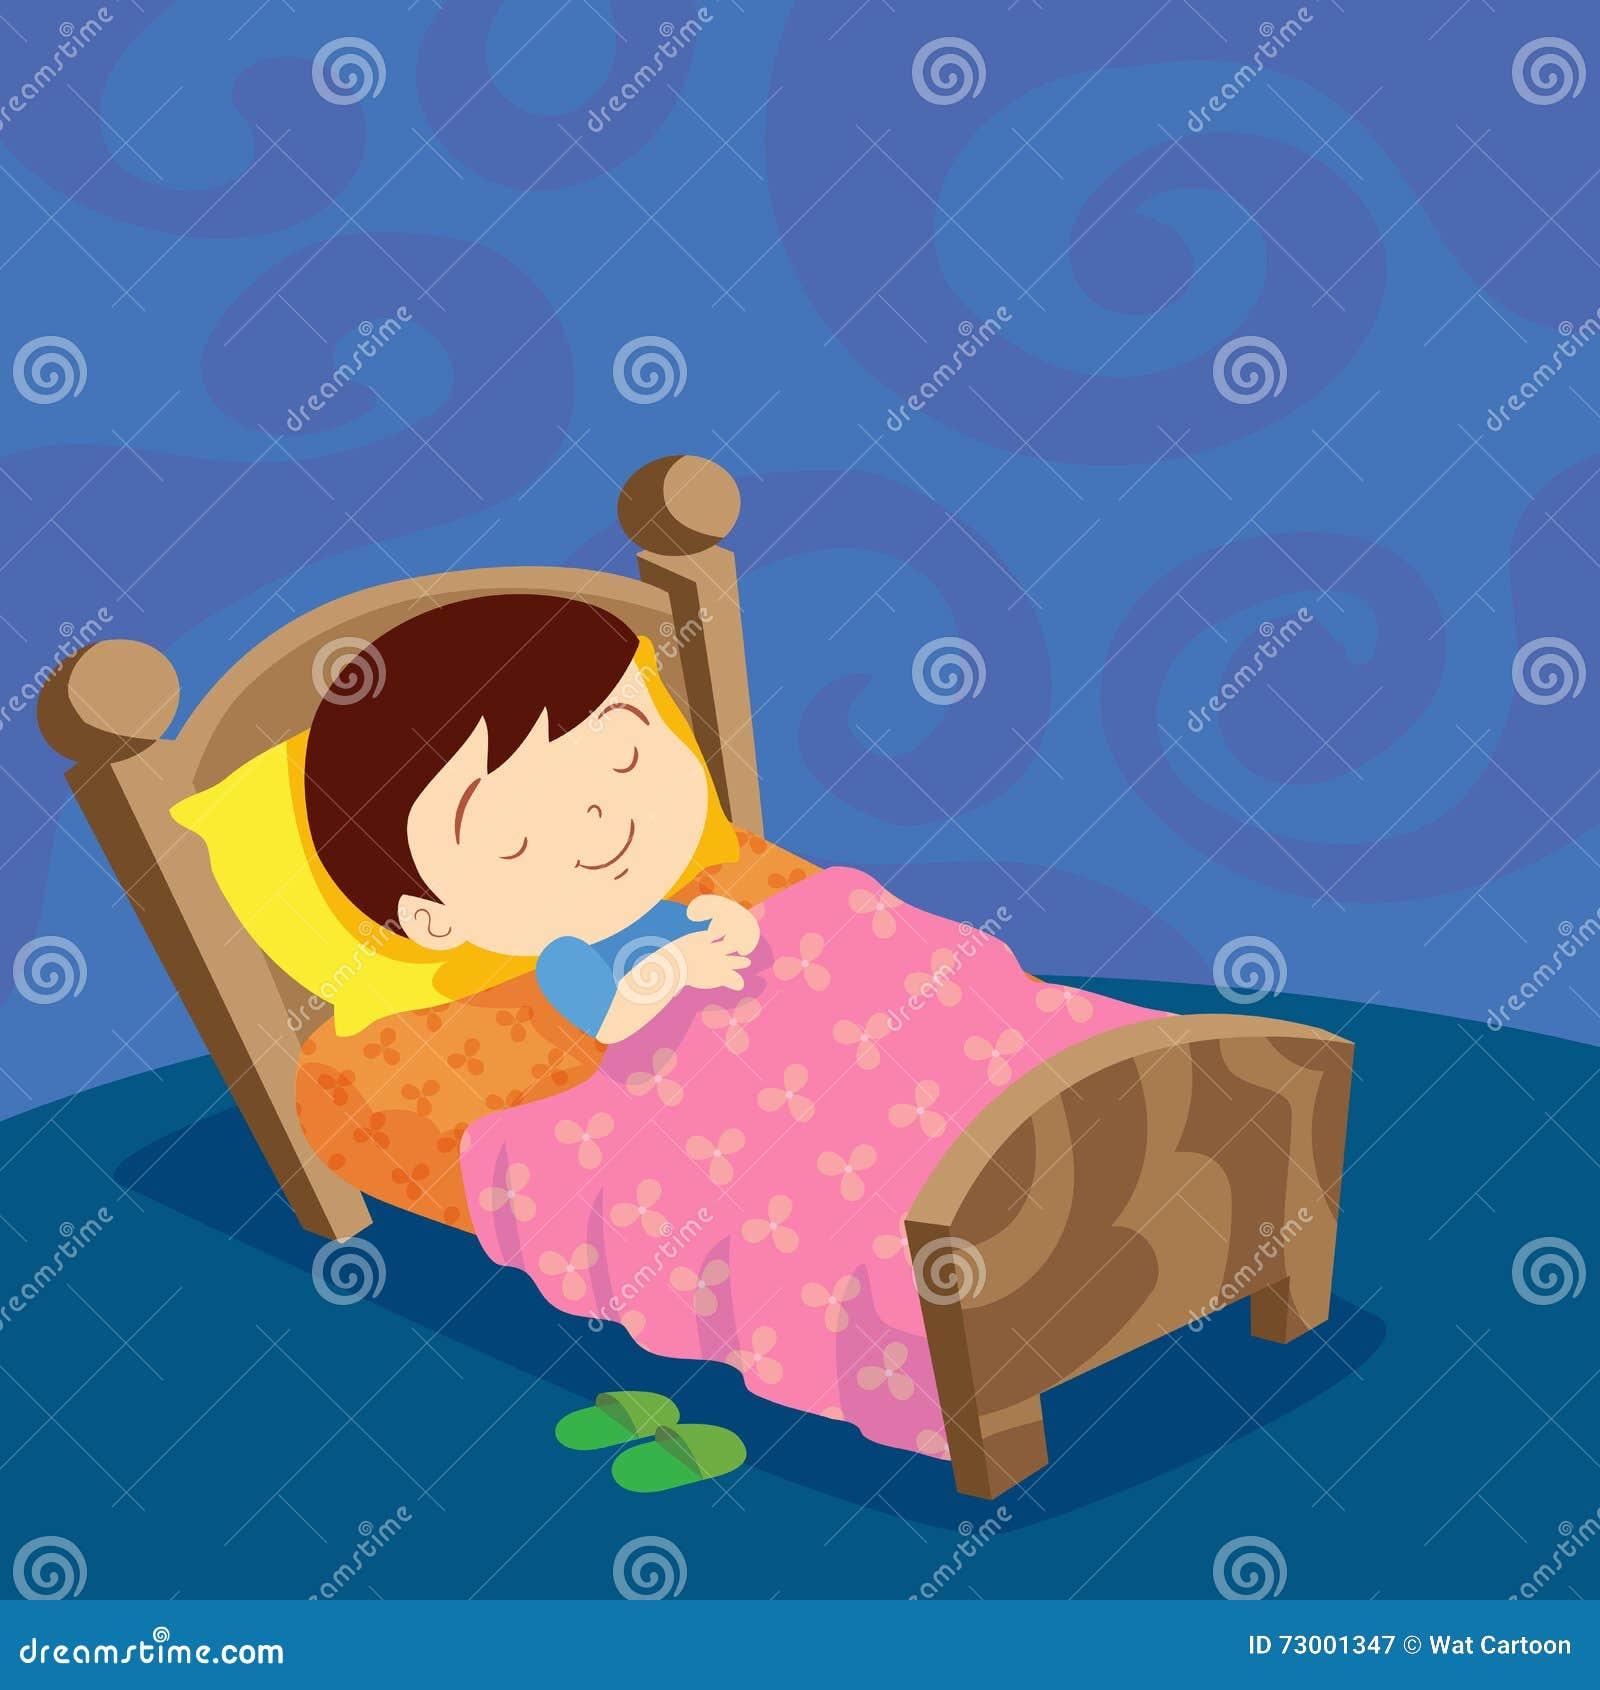 Boy sleep sweet dream